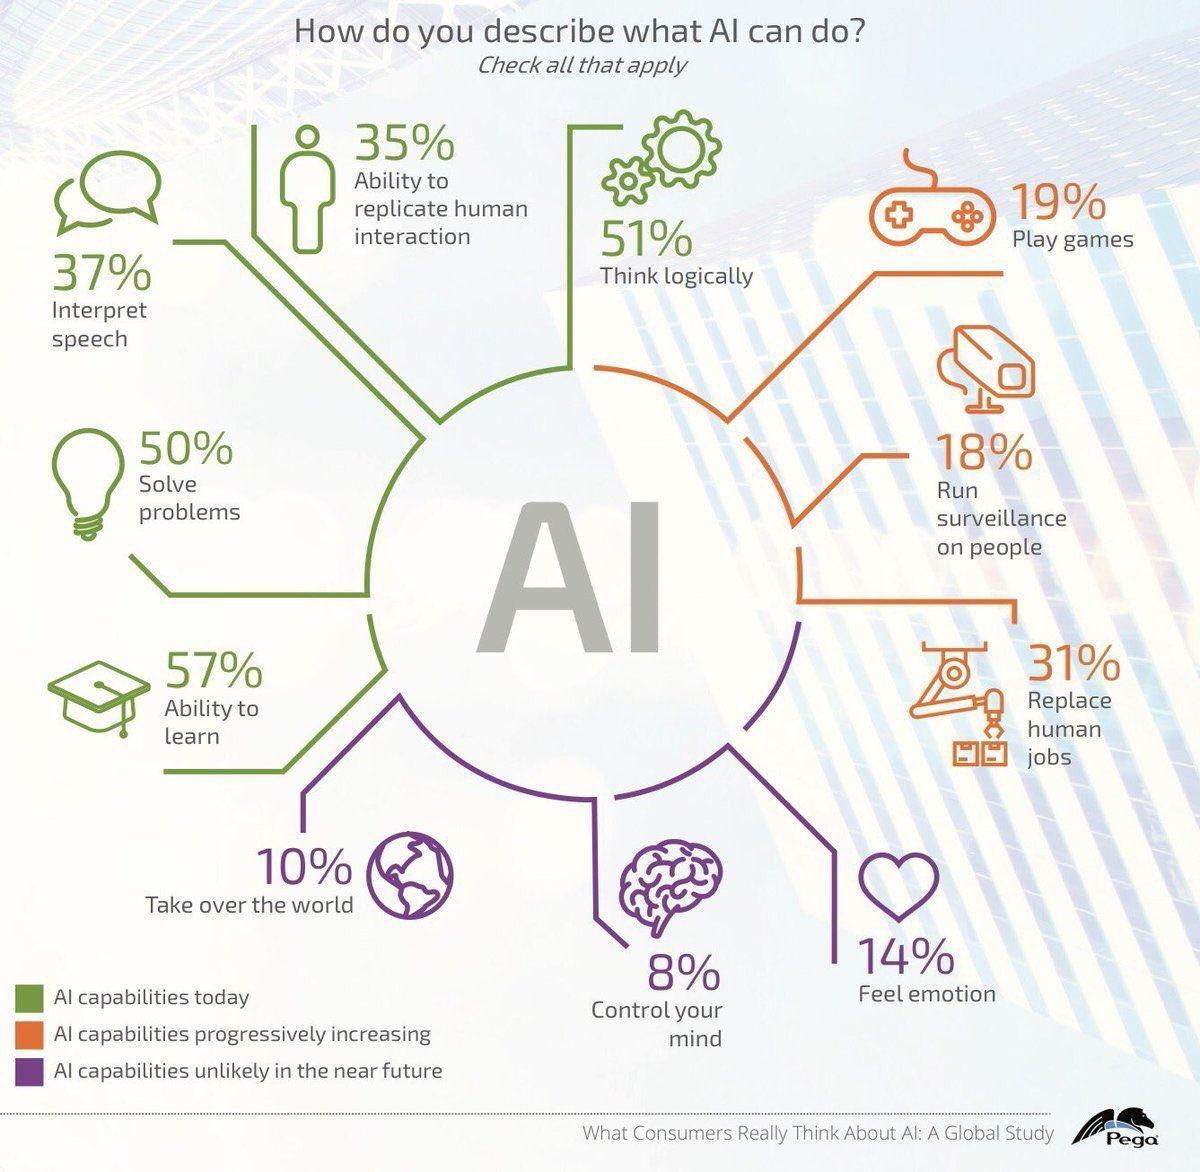 What Artificial Intelligence Can Do? #AI #NLP #Robots #ML #IoT #Privacy #FutureOfWork #mpgvip #defstar5 #makeyourownlane via @ipfconline1<br>http://pic.twitter.com/zHbWMz9TC6